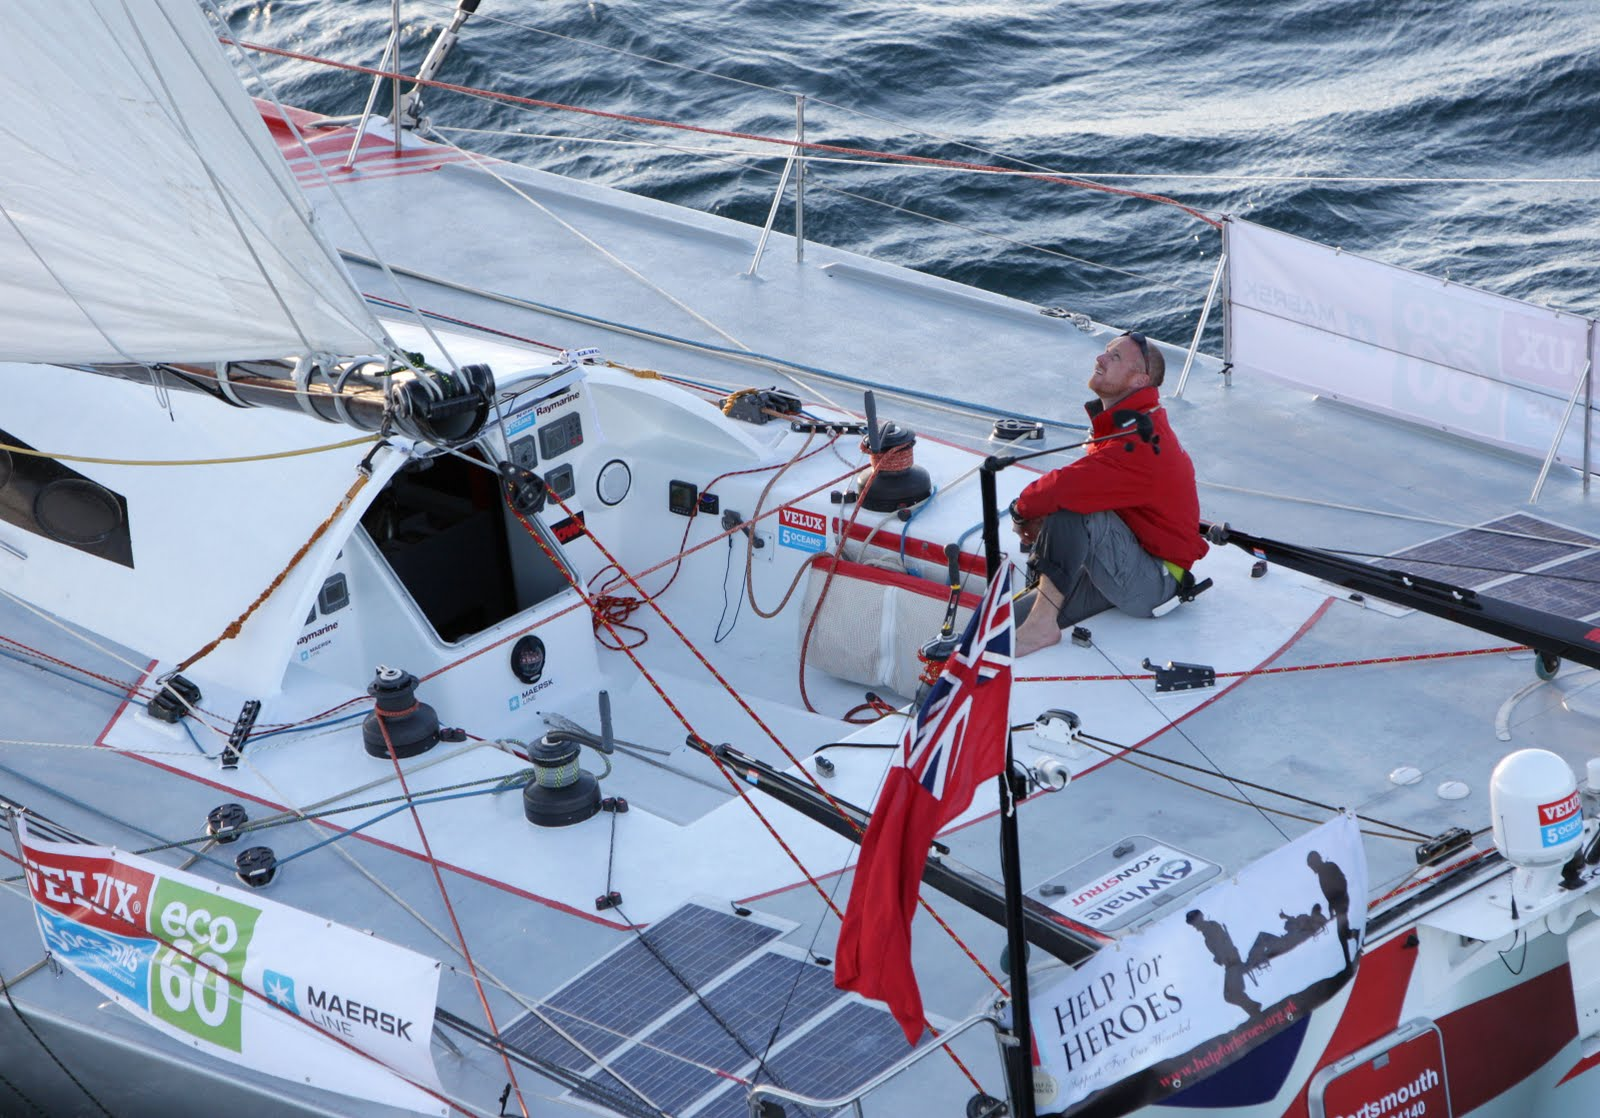 Sailracewin Velux 5 Oceans Csm Jumps Velux 5 Oceans